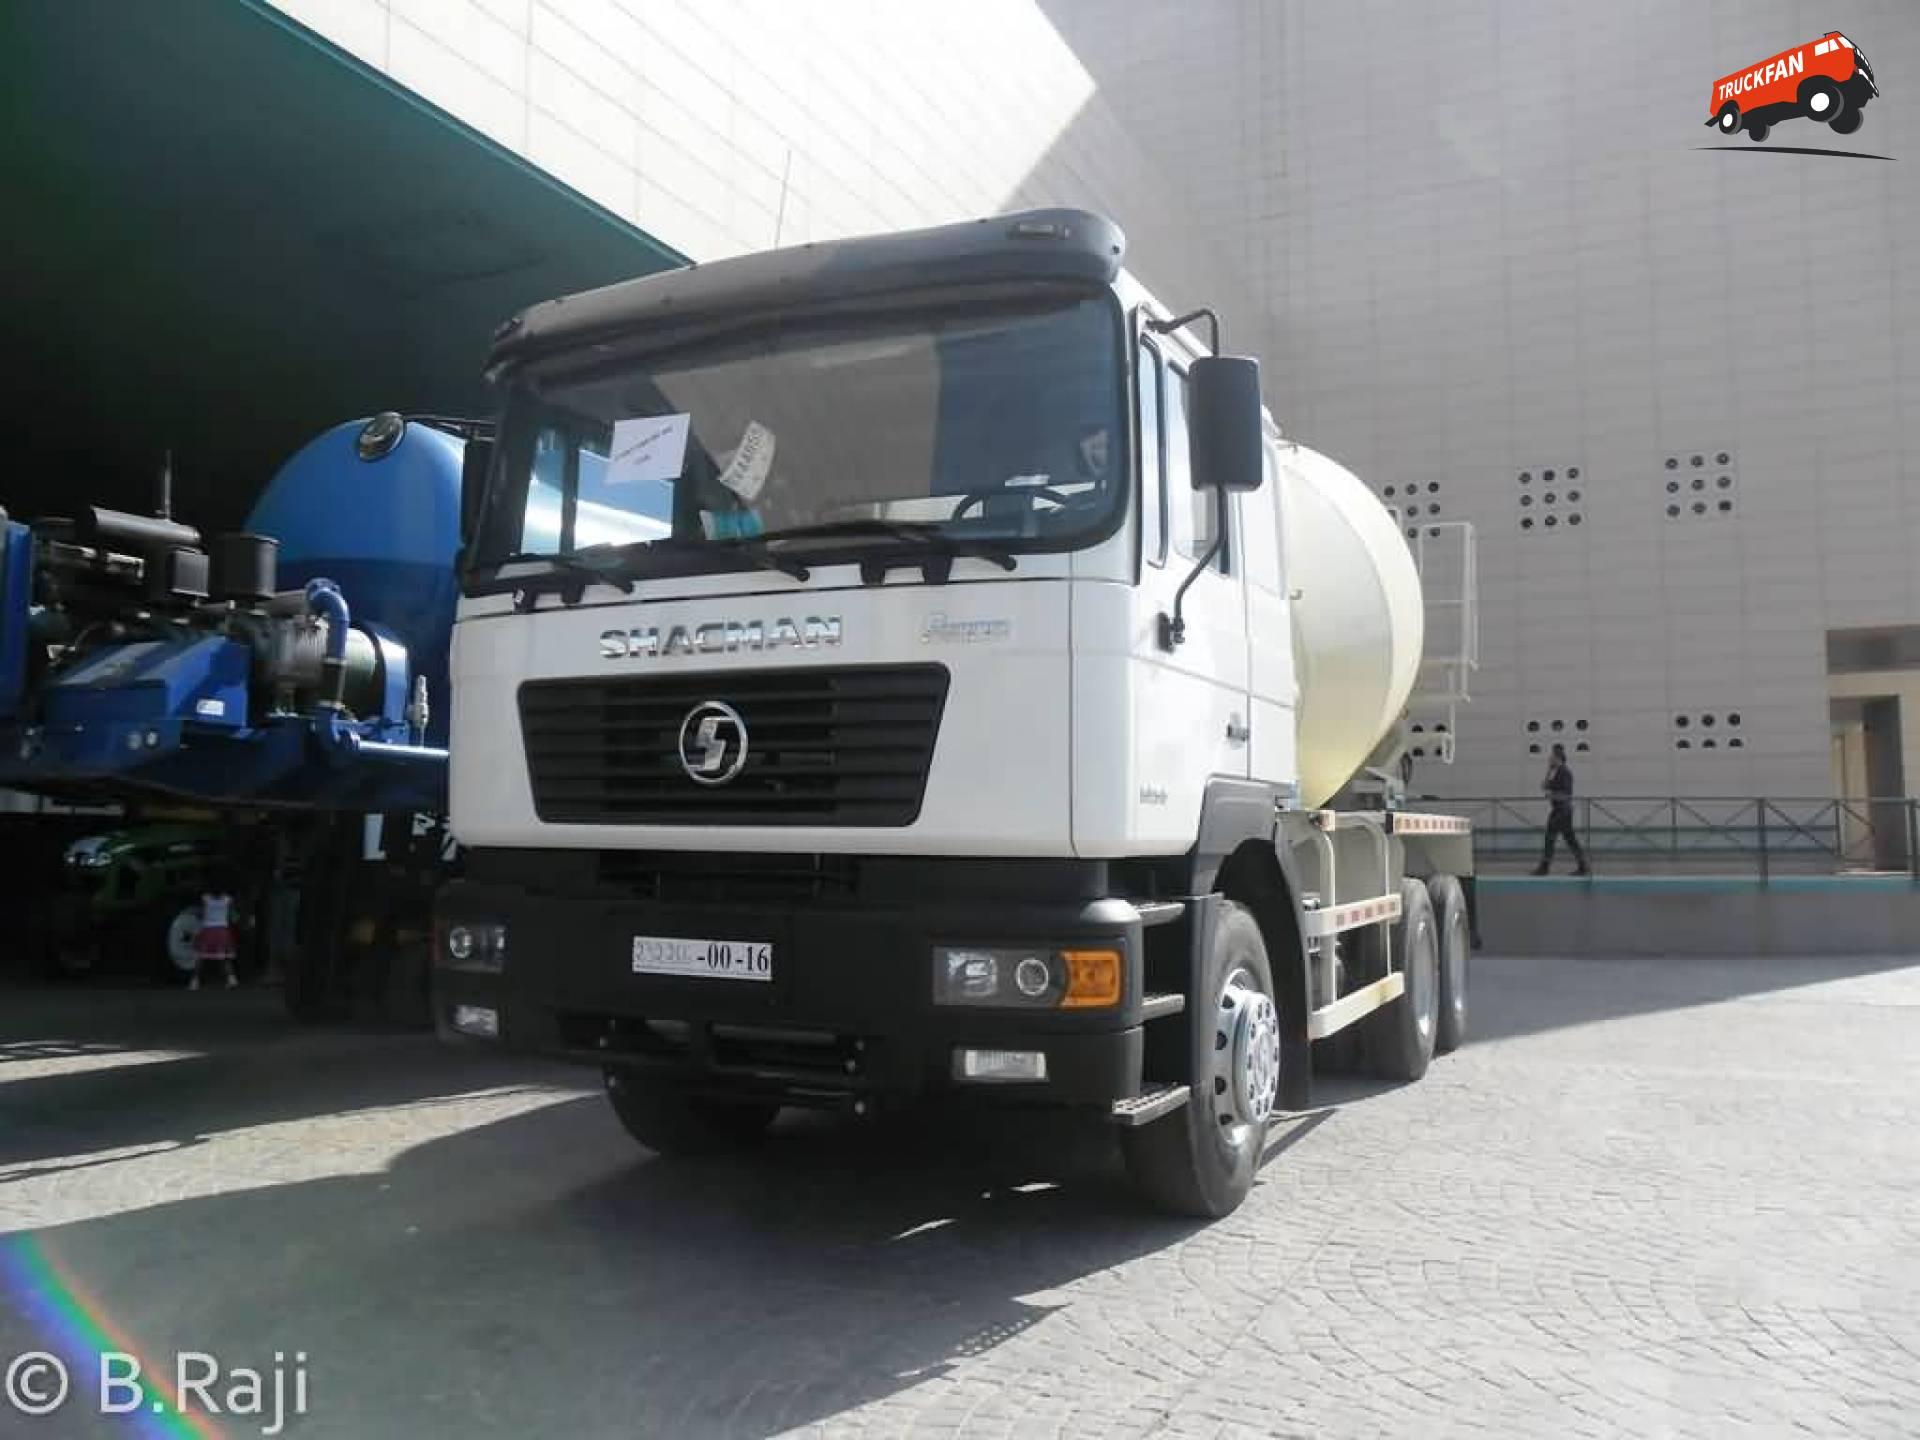 Shaanxi F2000